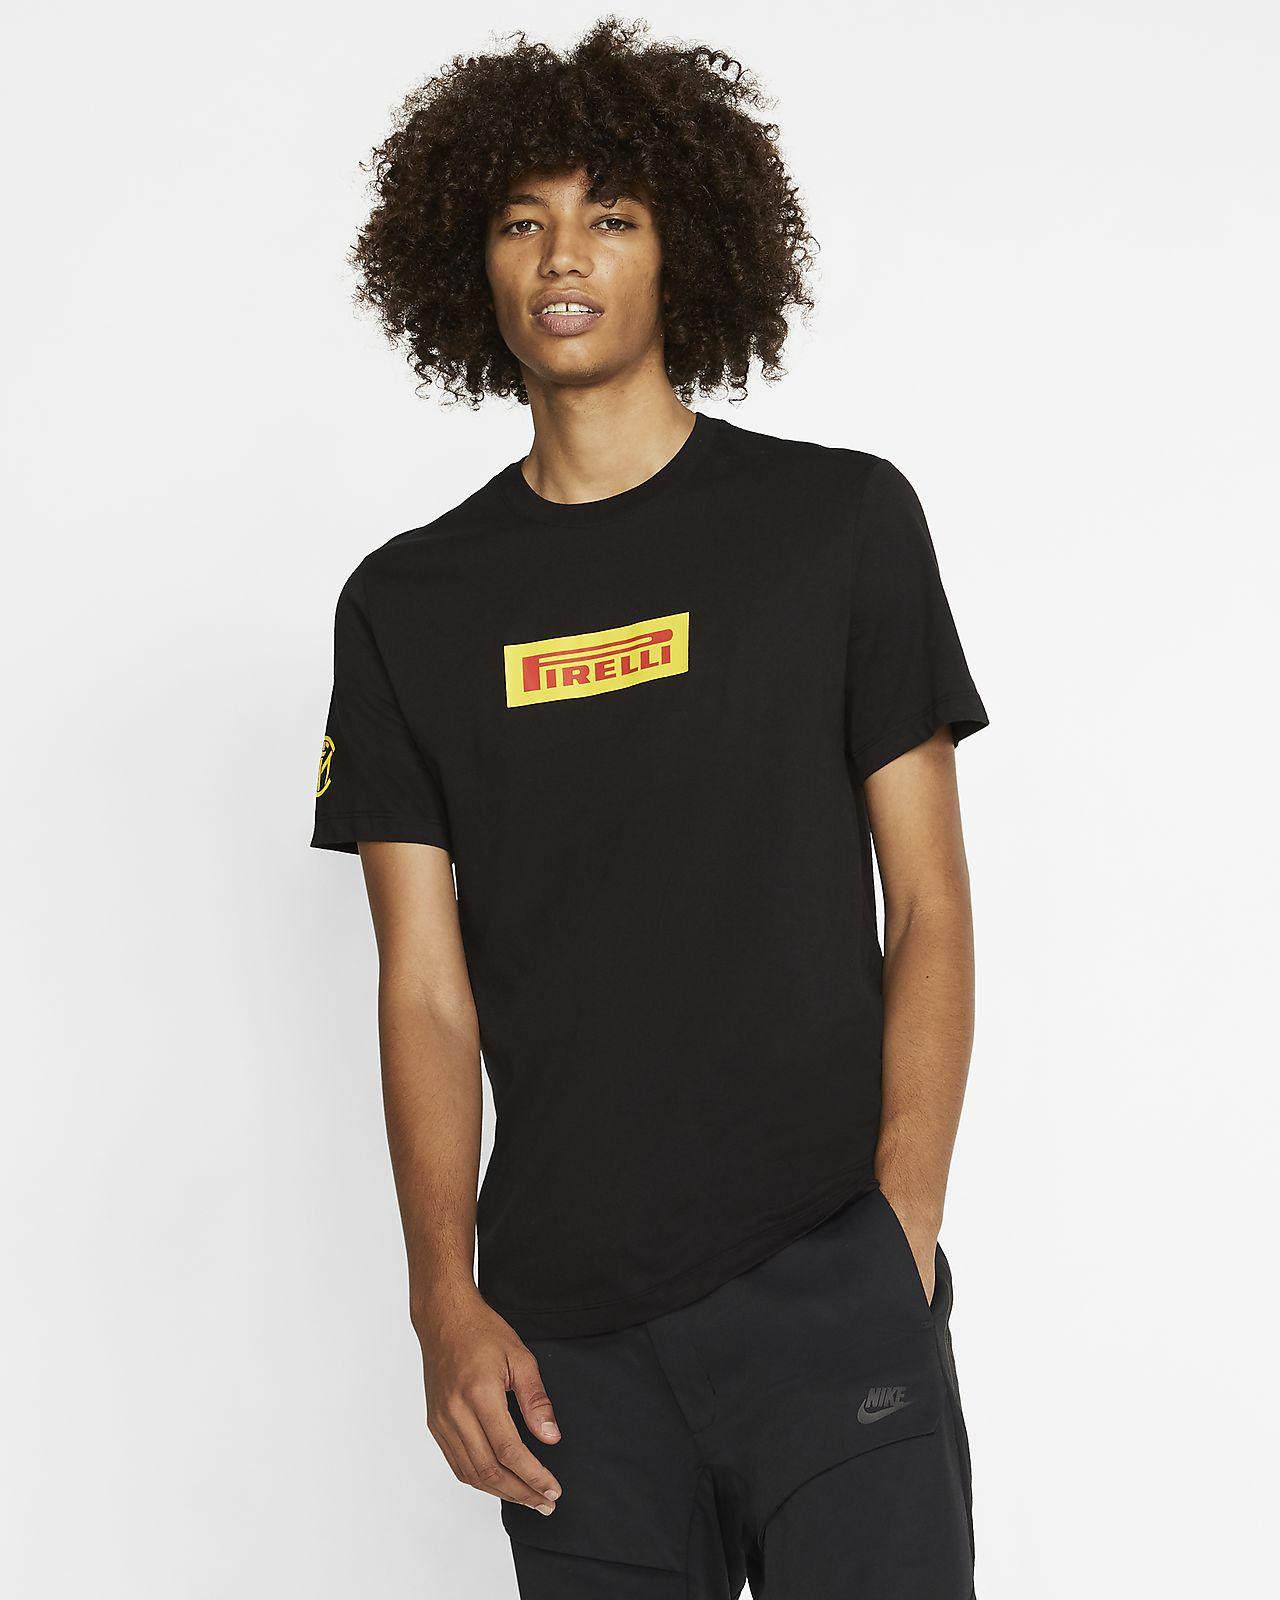 Inter Milan Men's Football T-Shirt